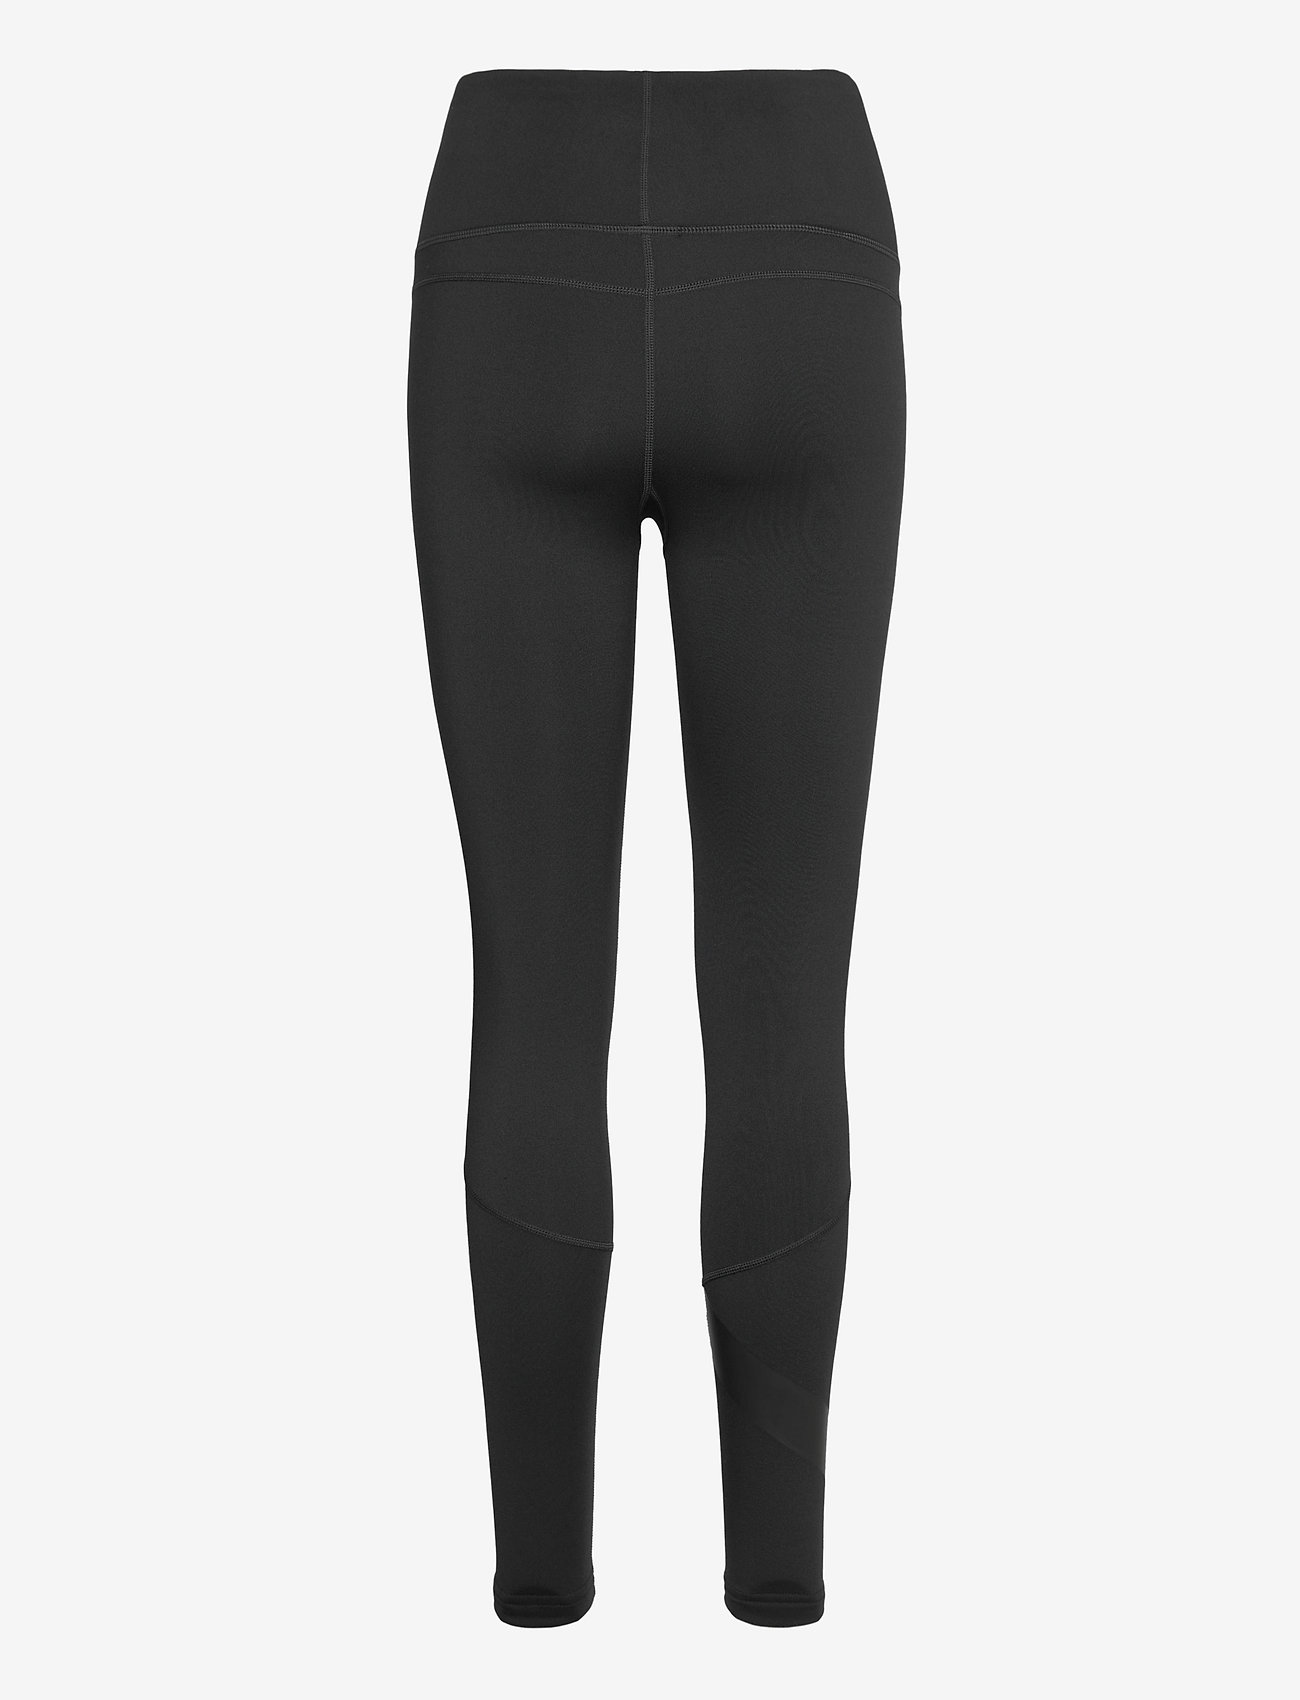 Adv Warm Hight Waist Tights W (Black) (44.97 €) - Craft AFOBA